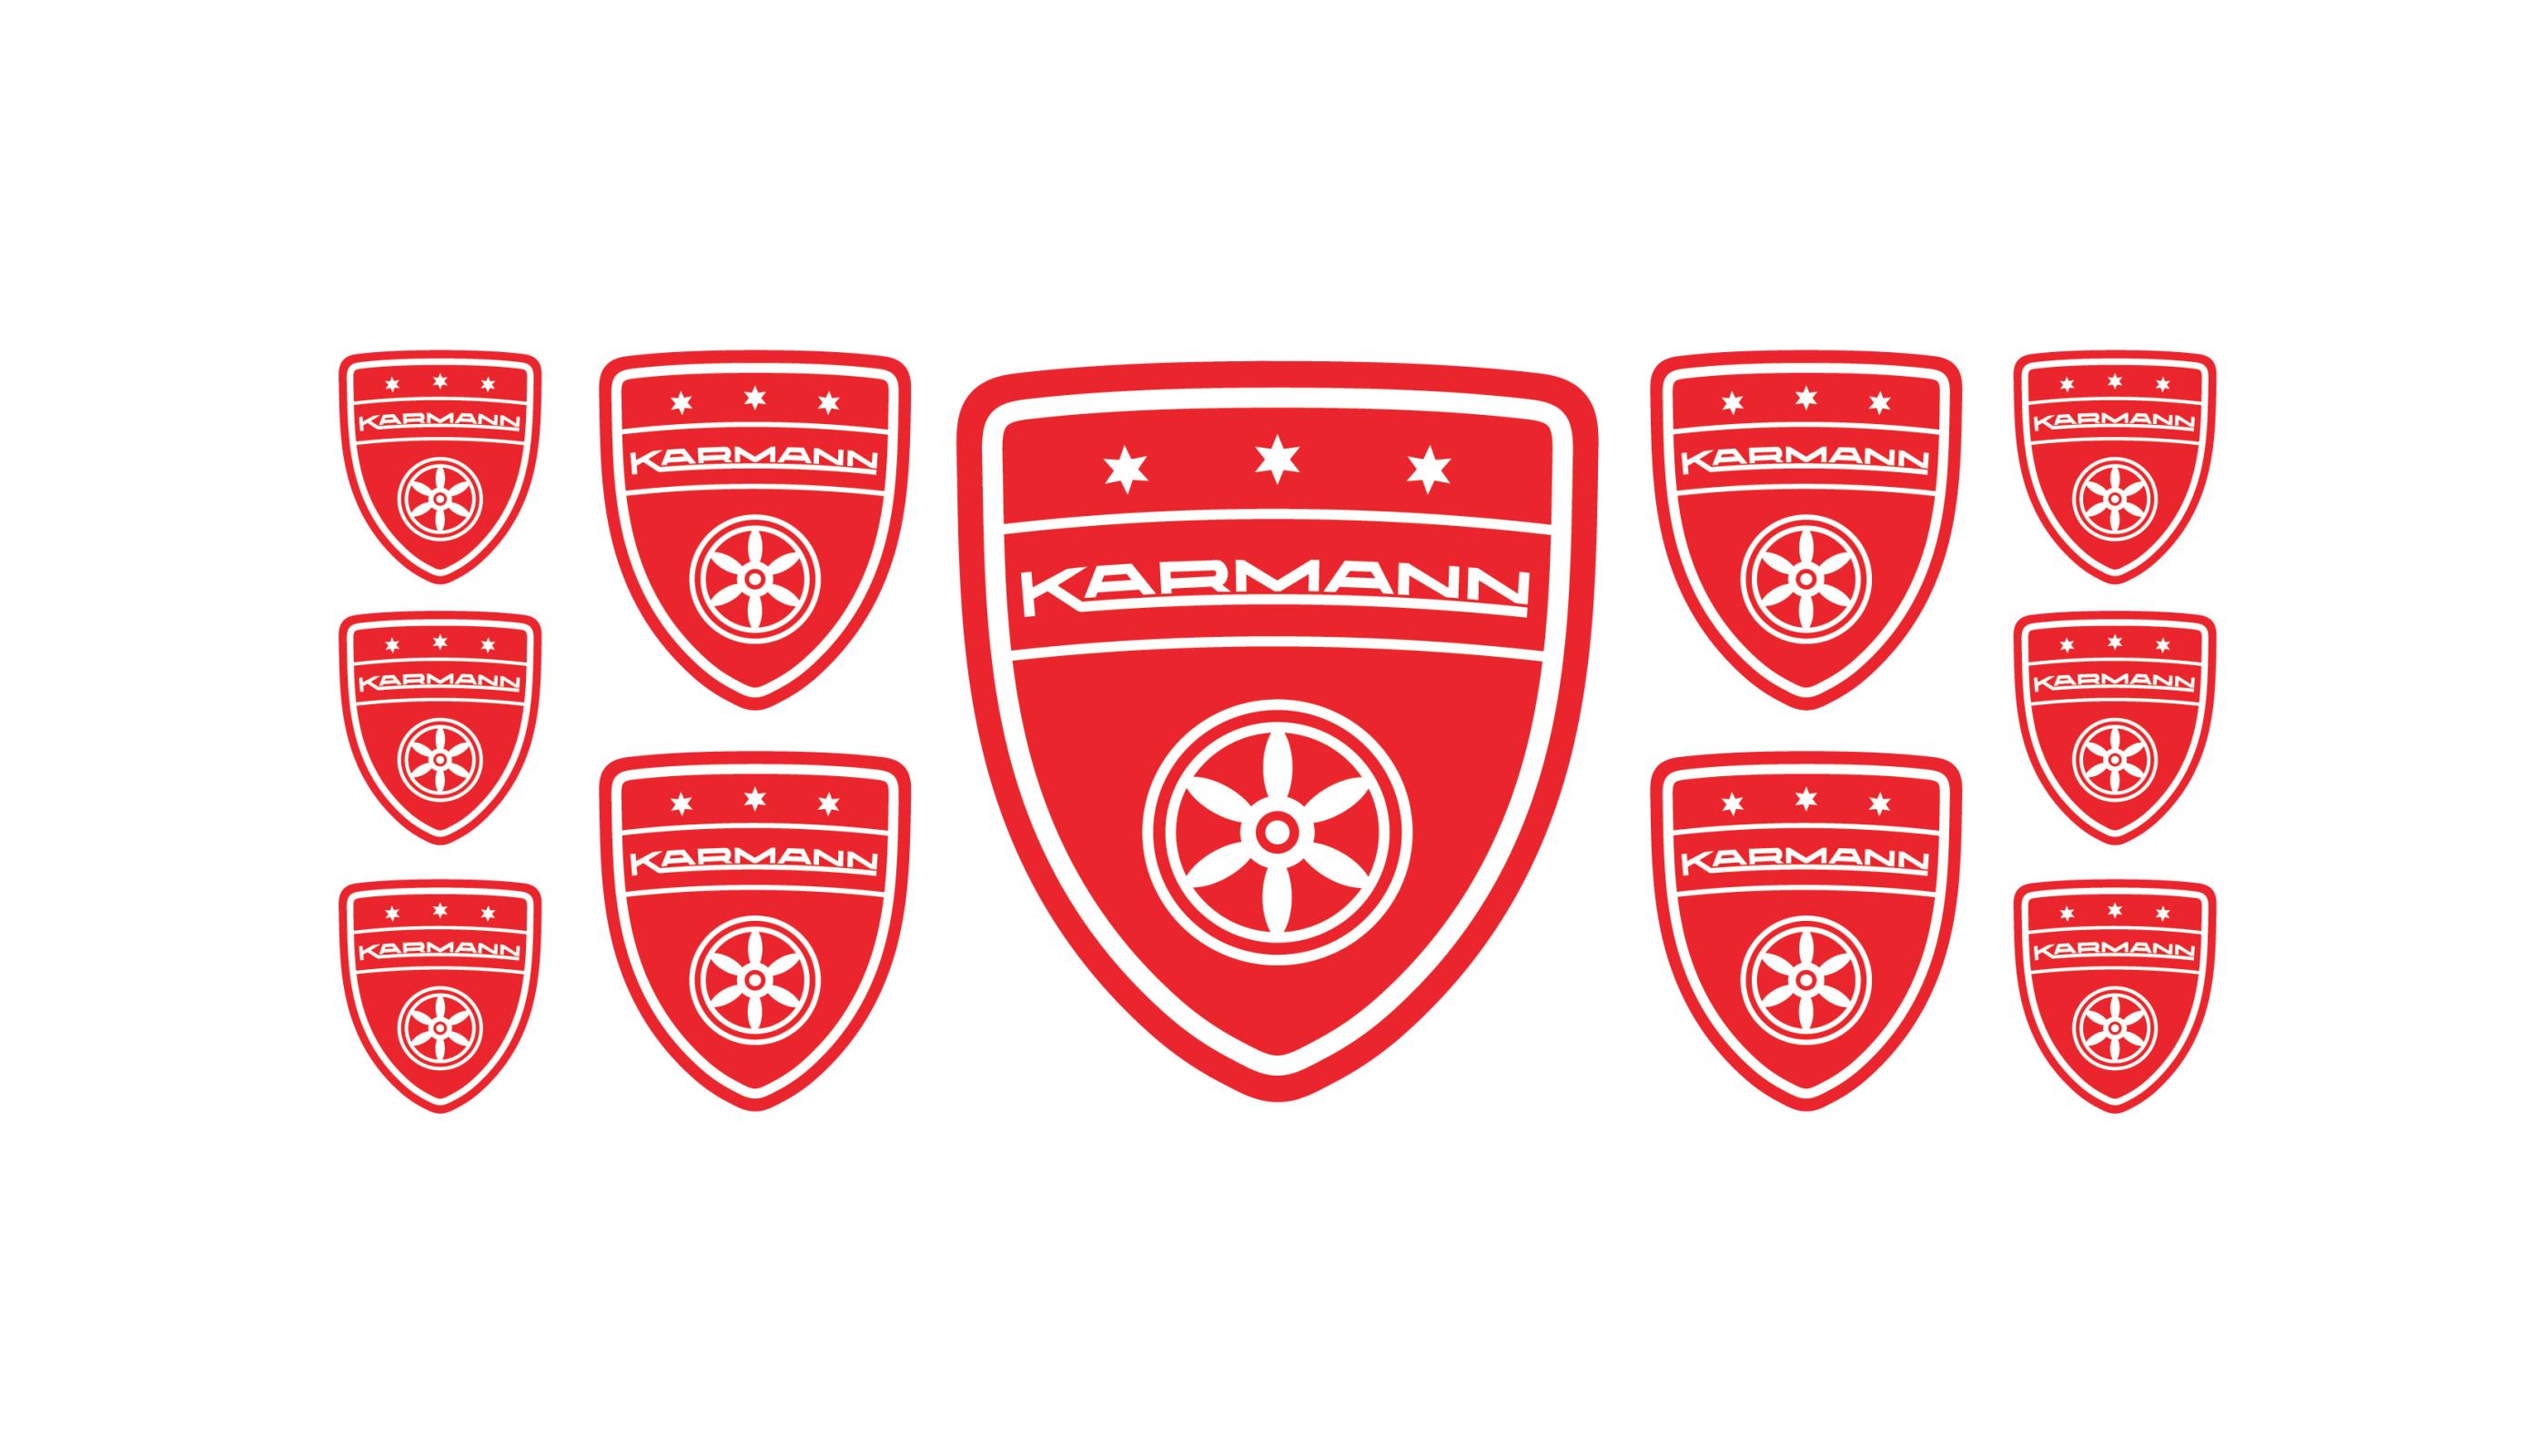 Karmann red emblems